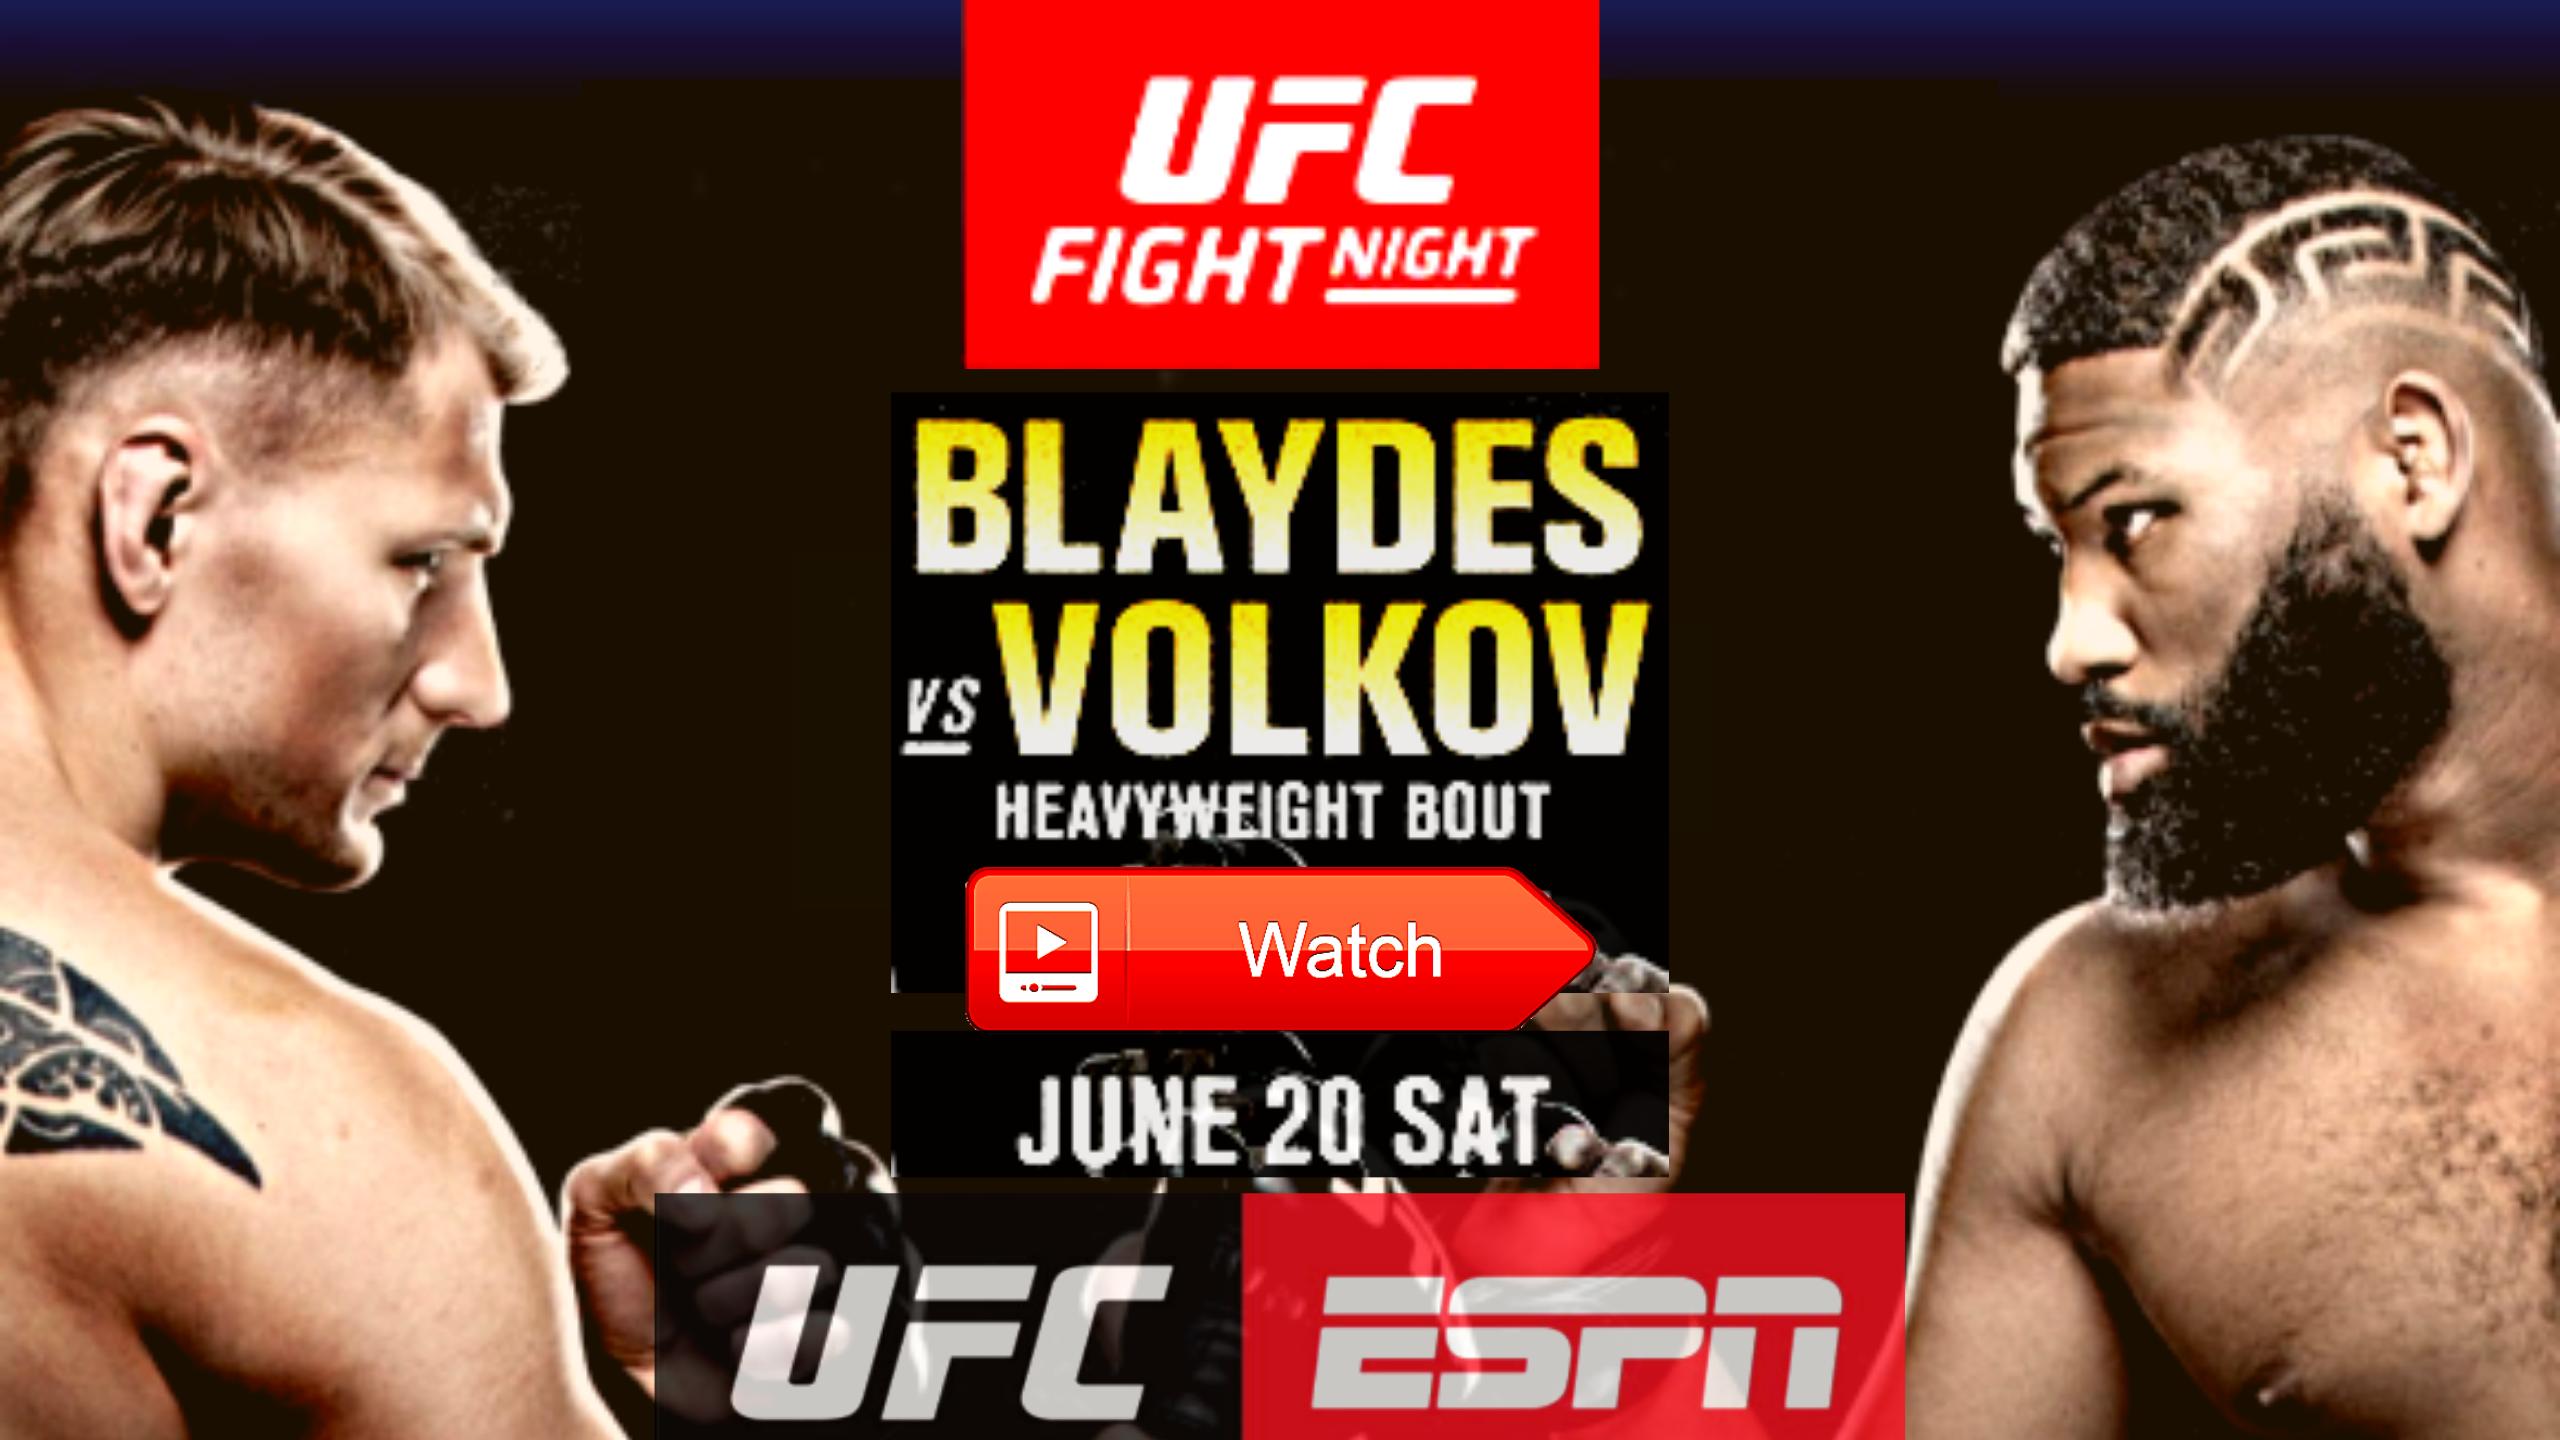 Blaydes Vs Volkov Livestream Free Volkov Vs Blaydes Ufc Fight Night 2020 In 2020 Ufc Fight Night Ufc Live Video Streaming